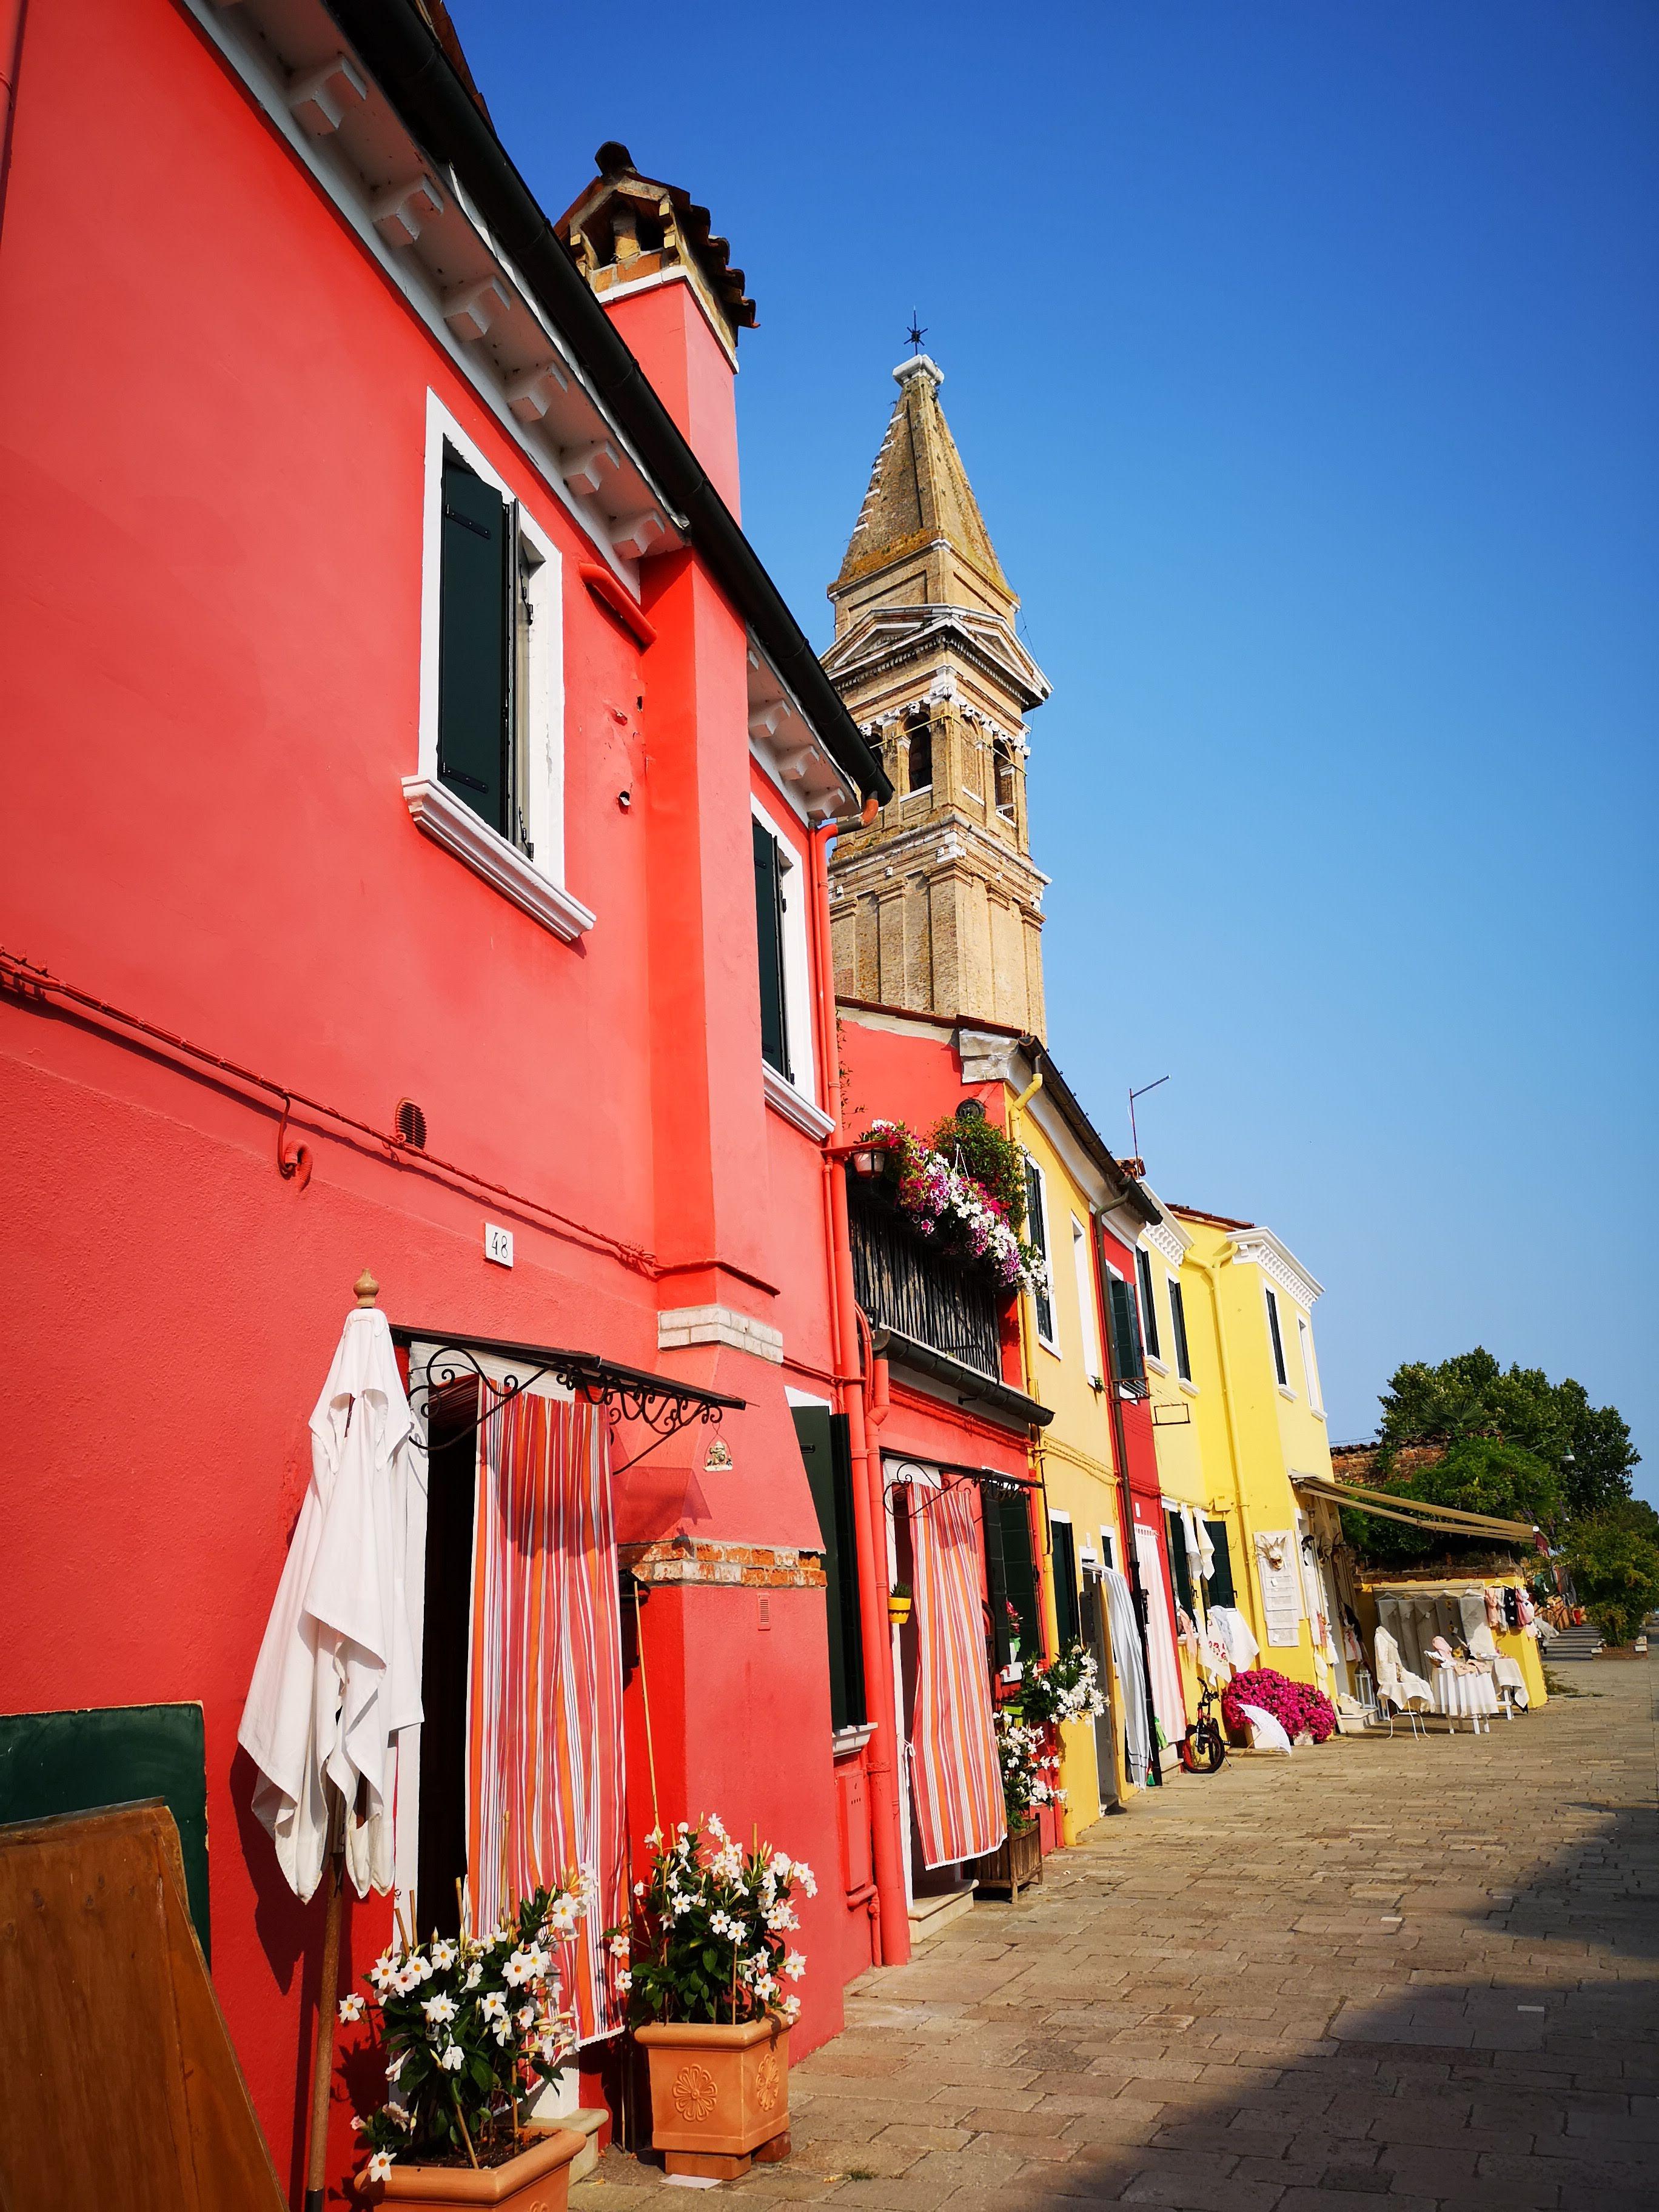 Burano, rainbow island